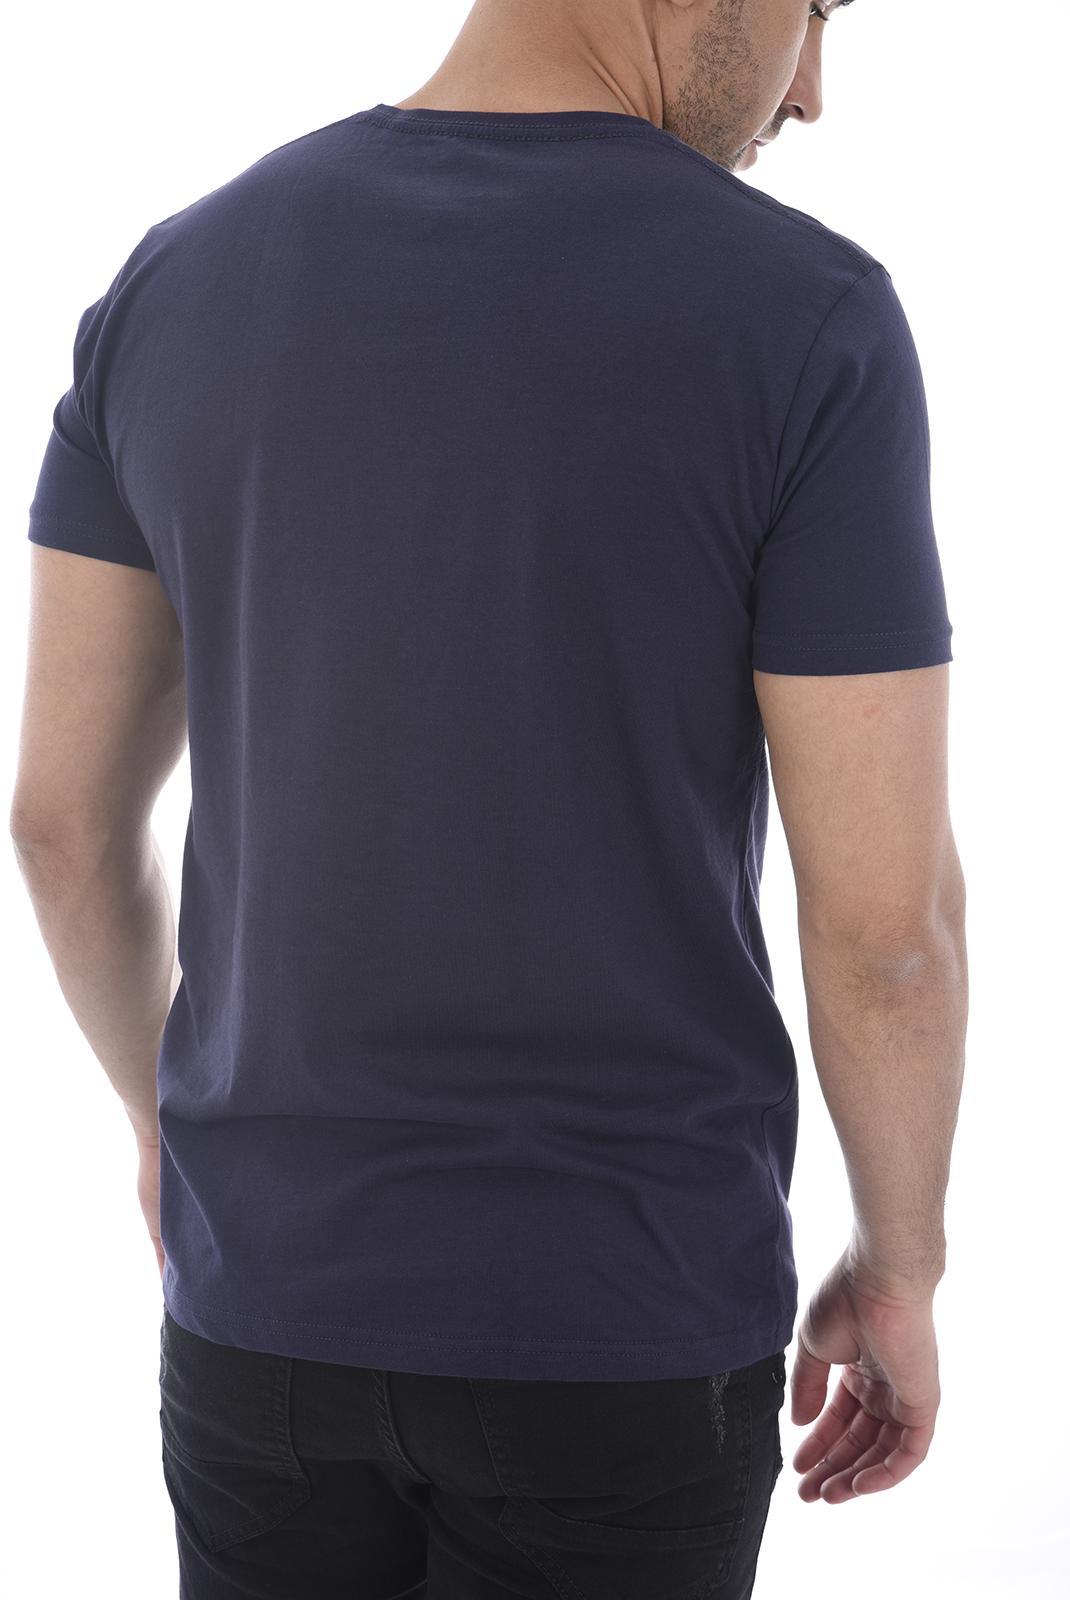 Tee-shirts  V1969 by Versace 1969 FORLI MARINE